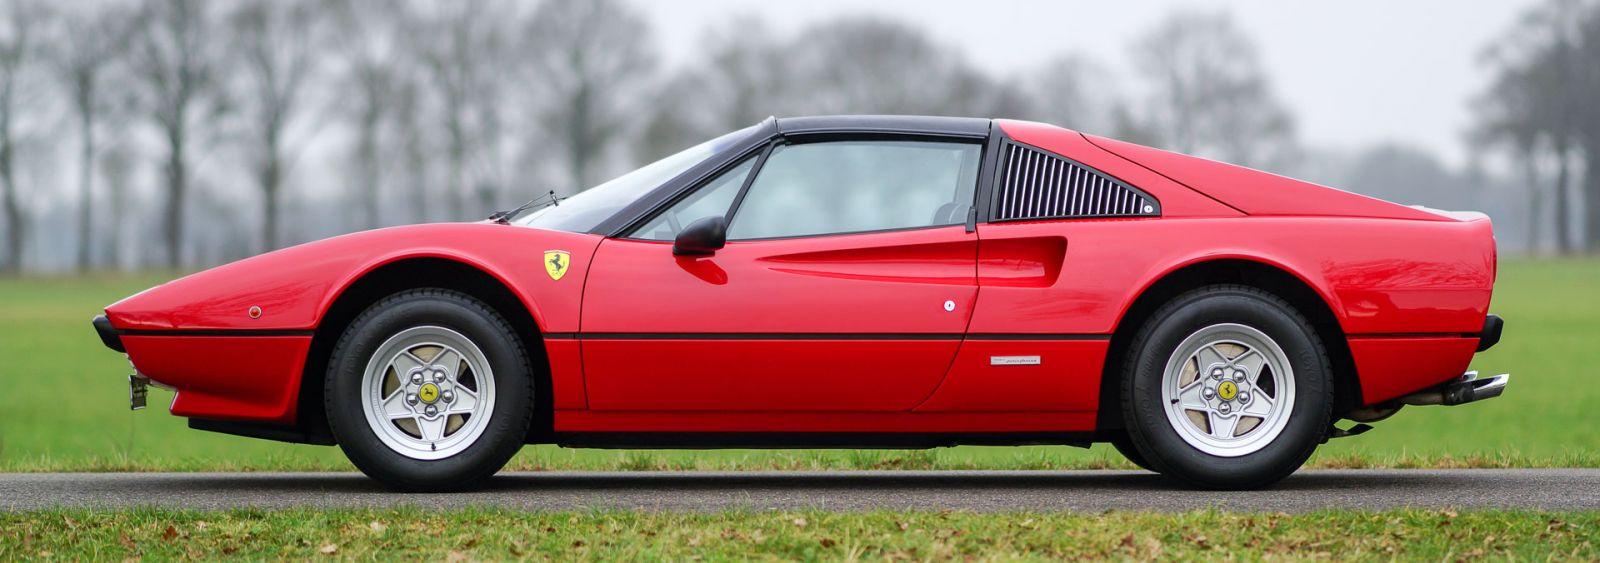 Ferrari 308 Gts 1978 Classicargarage De